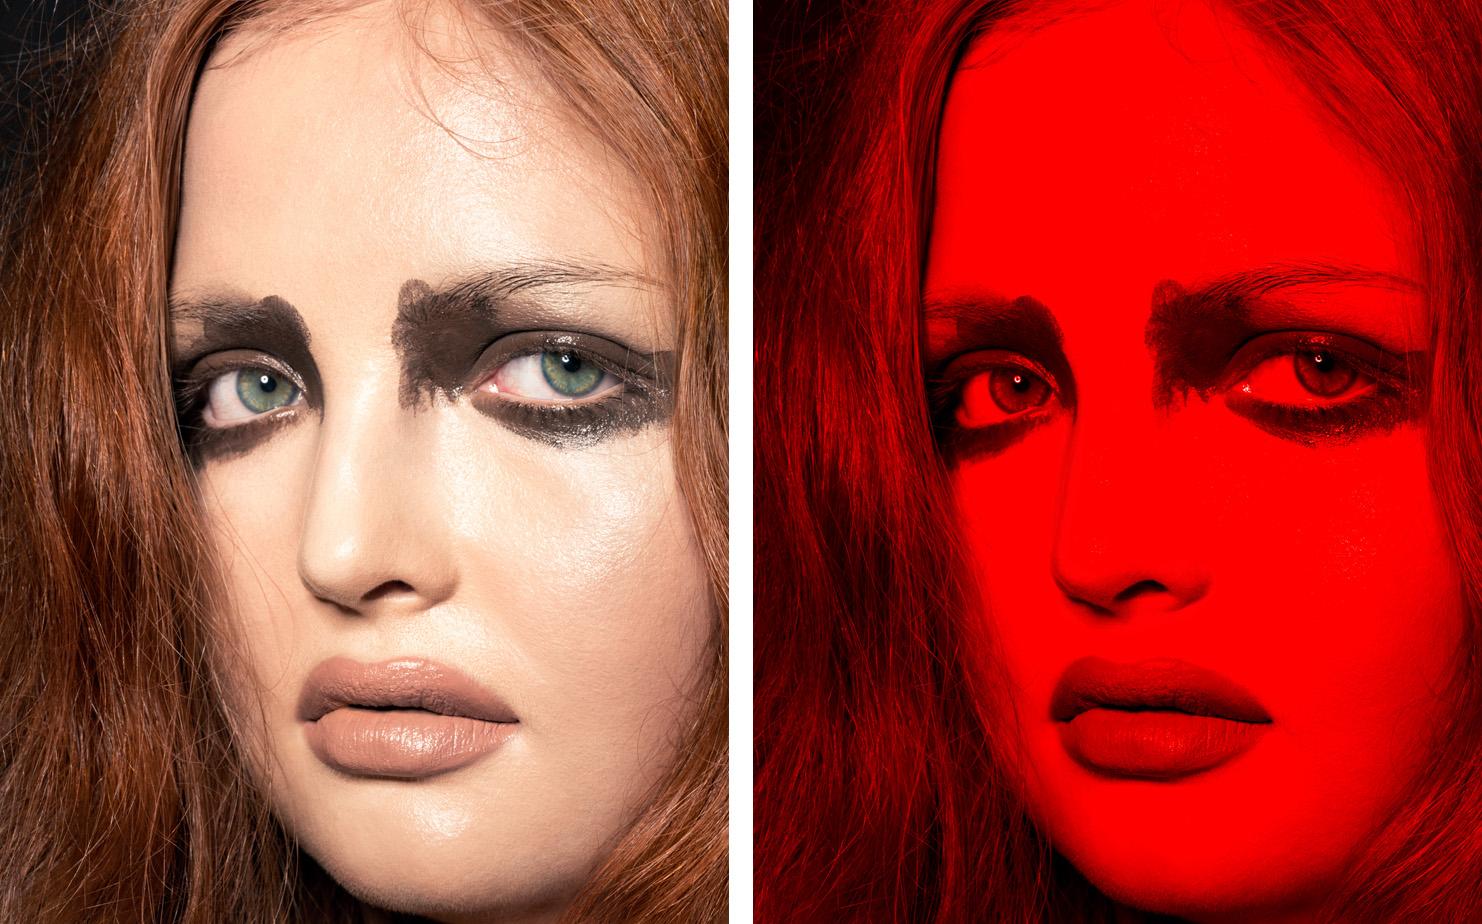 Vogue Italia A Vogue Tribute to Mina   CREATIVE DIRECTOR Giovanni Bianco  MAKEUP ARTIST Fulvia Farolfi  MODEL Tess McMillan